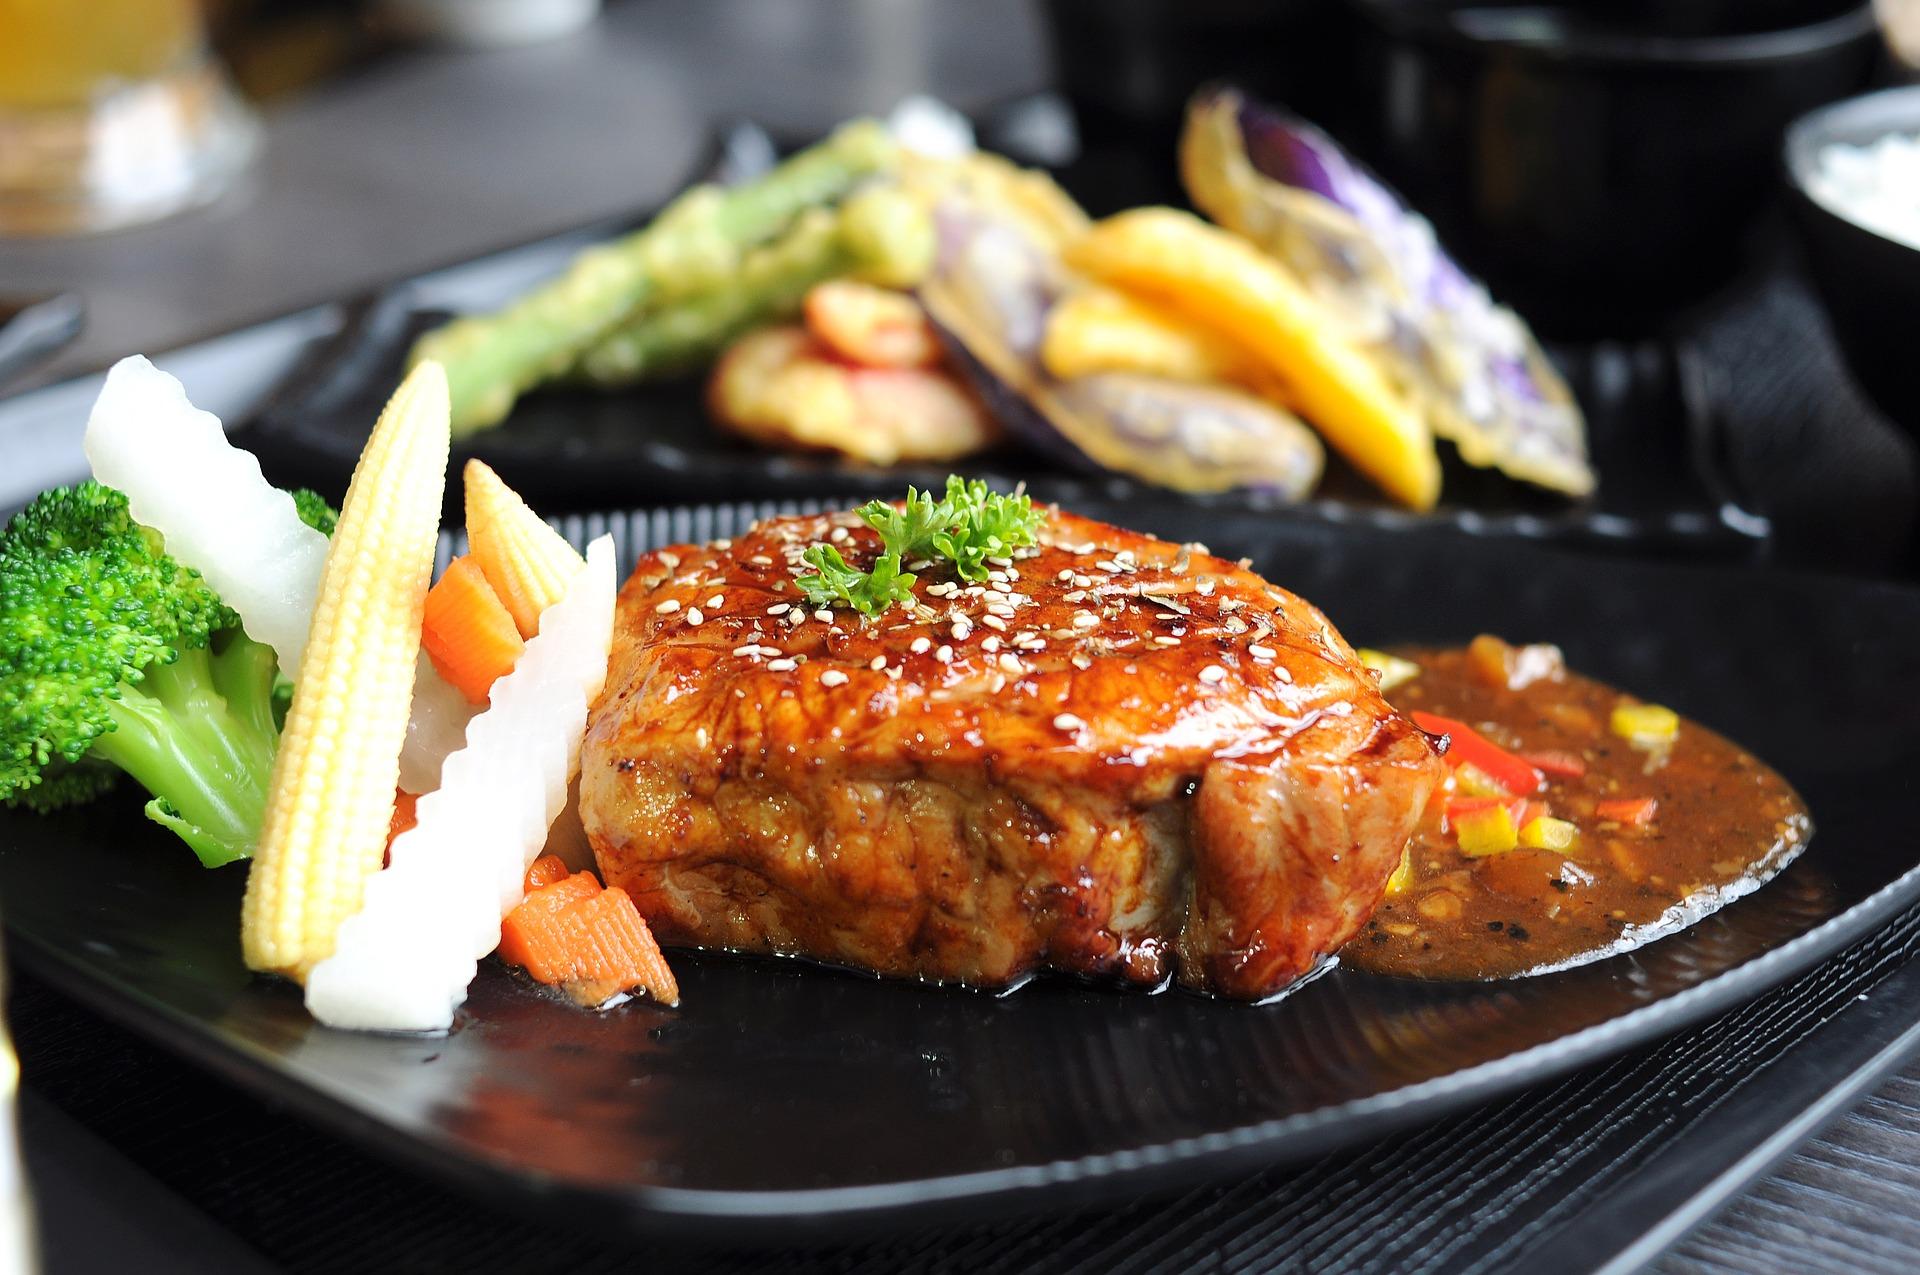 thick-pig-roast-filet-izod-black-pepper-2336138_1920.jpg